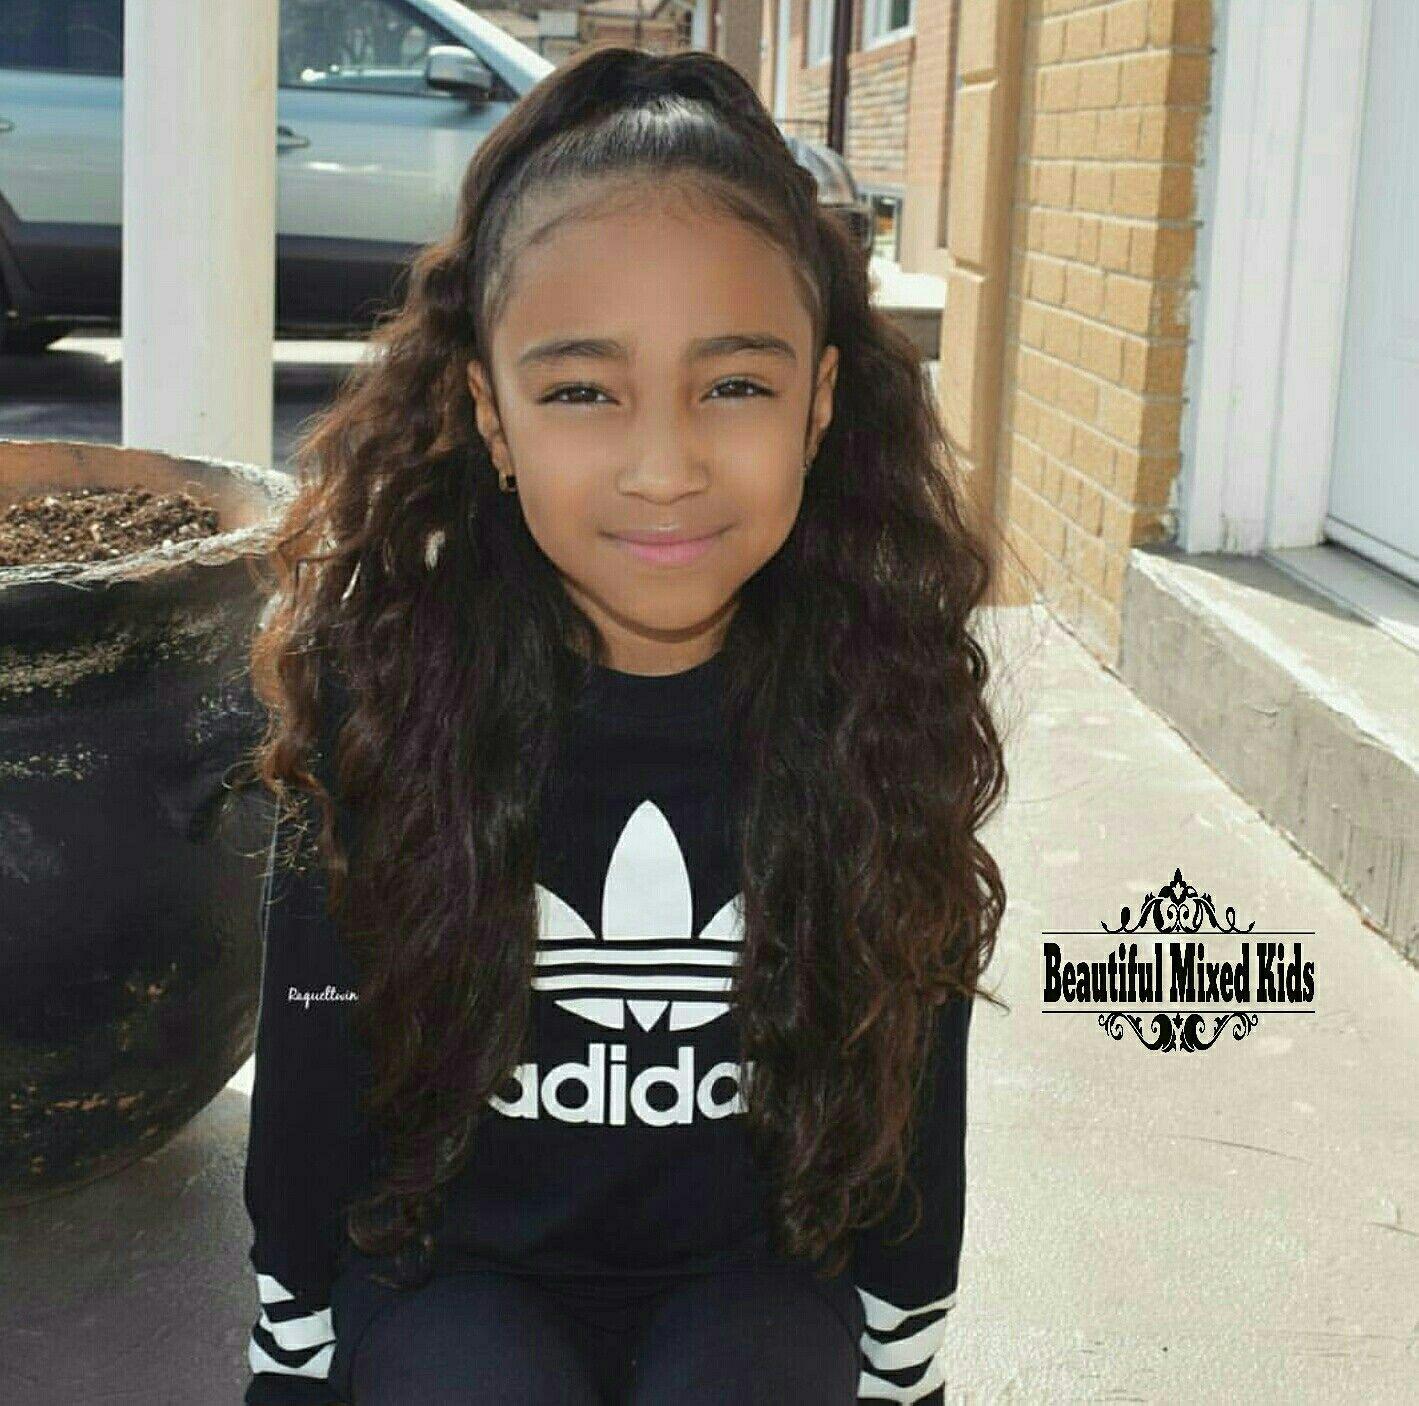 Atiana 7 Years Portuguese Jamaican Follow Beautifulmixedkids On Instagram Www Stylishkidsa Mixed Kids Hairstyles Kids Hairstyles Girls Cute Mixed Kids